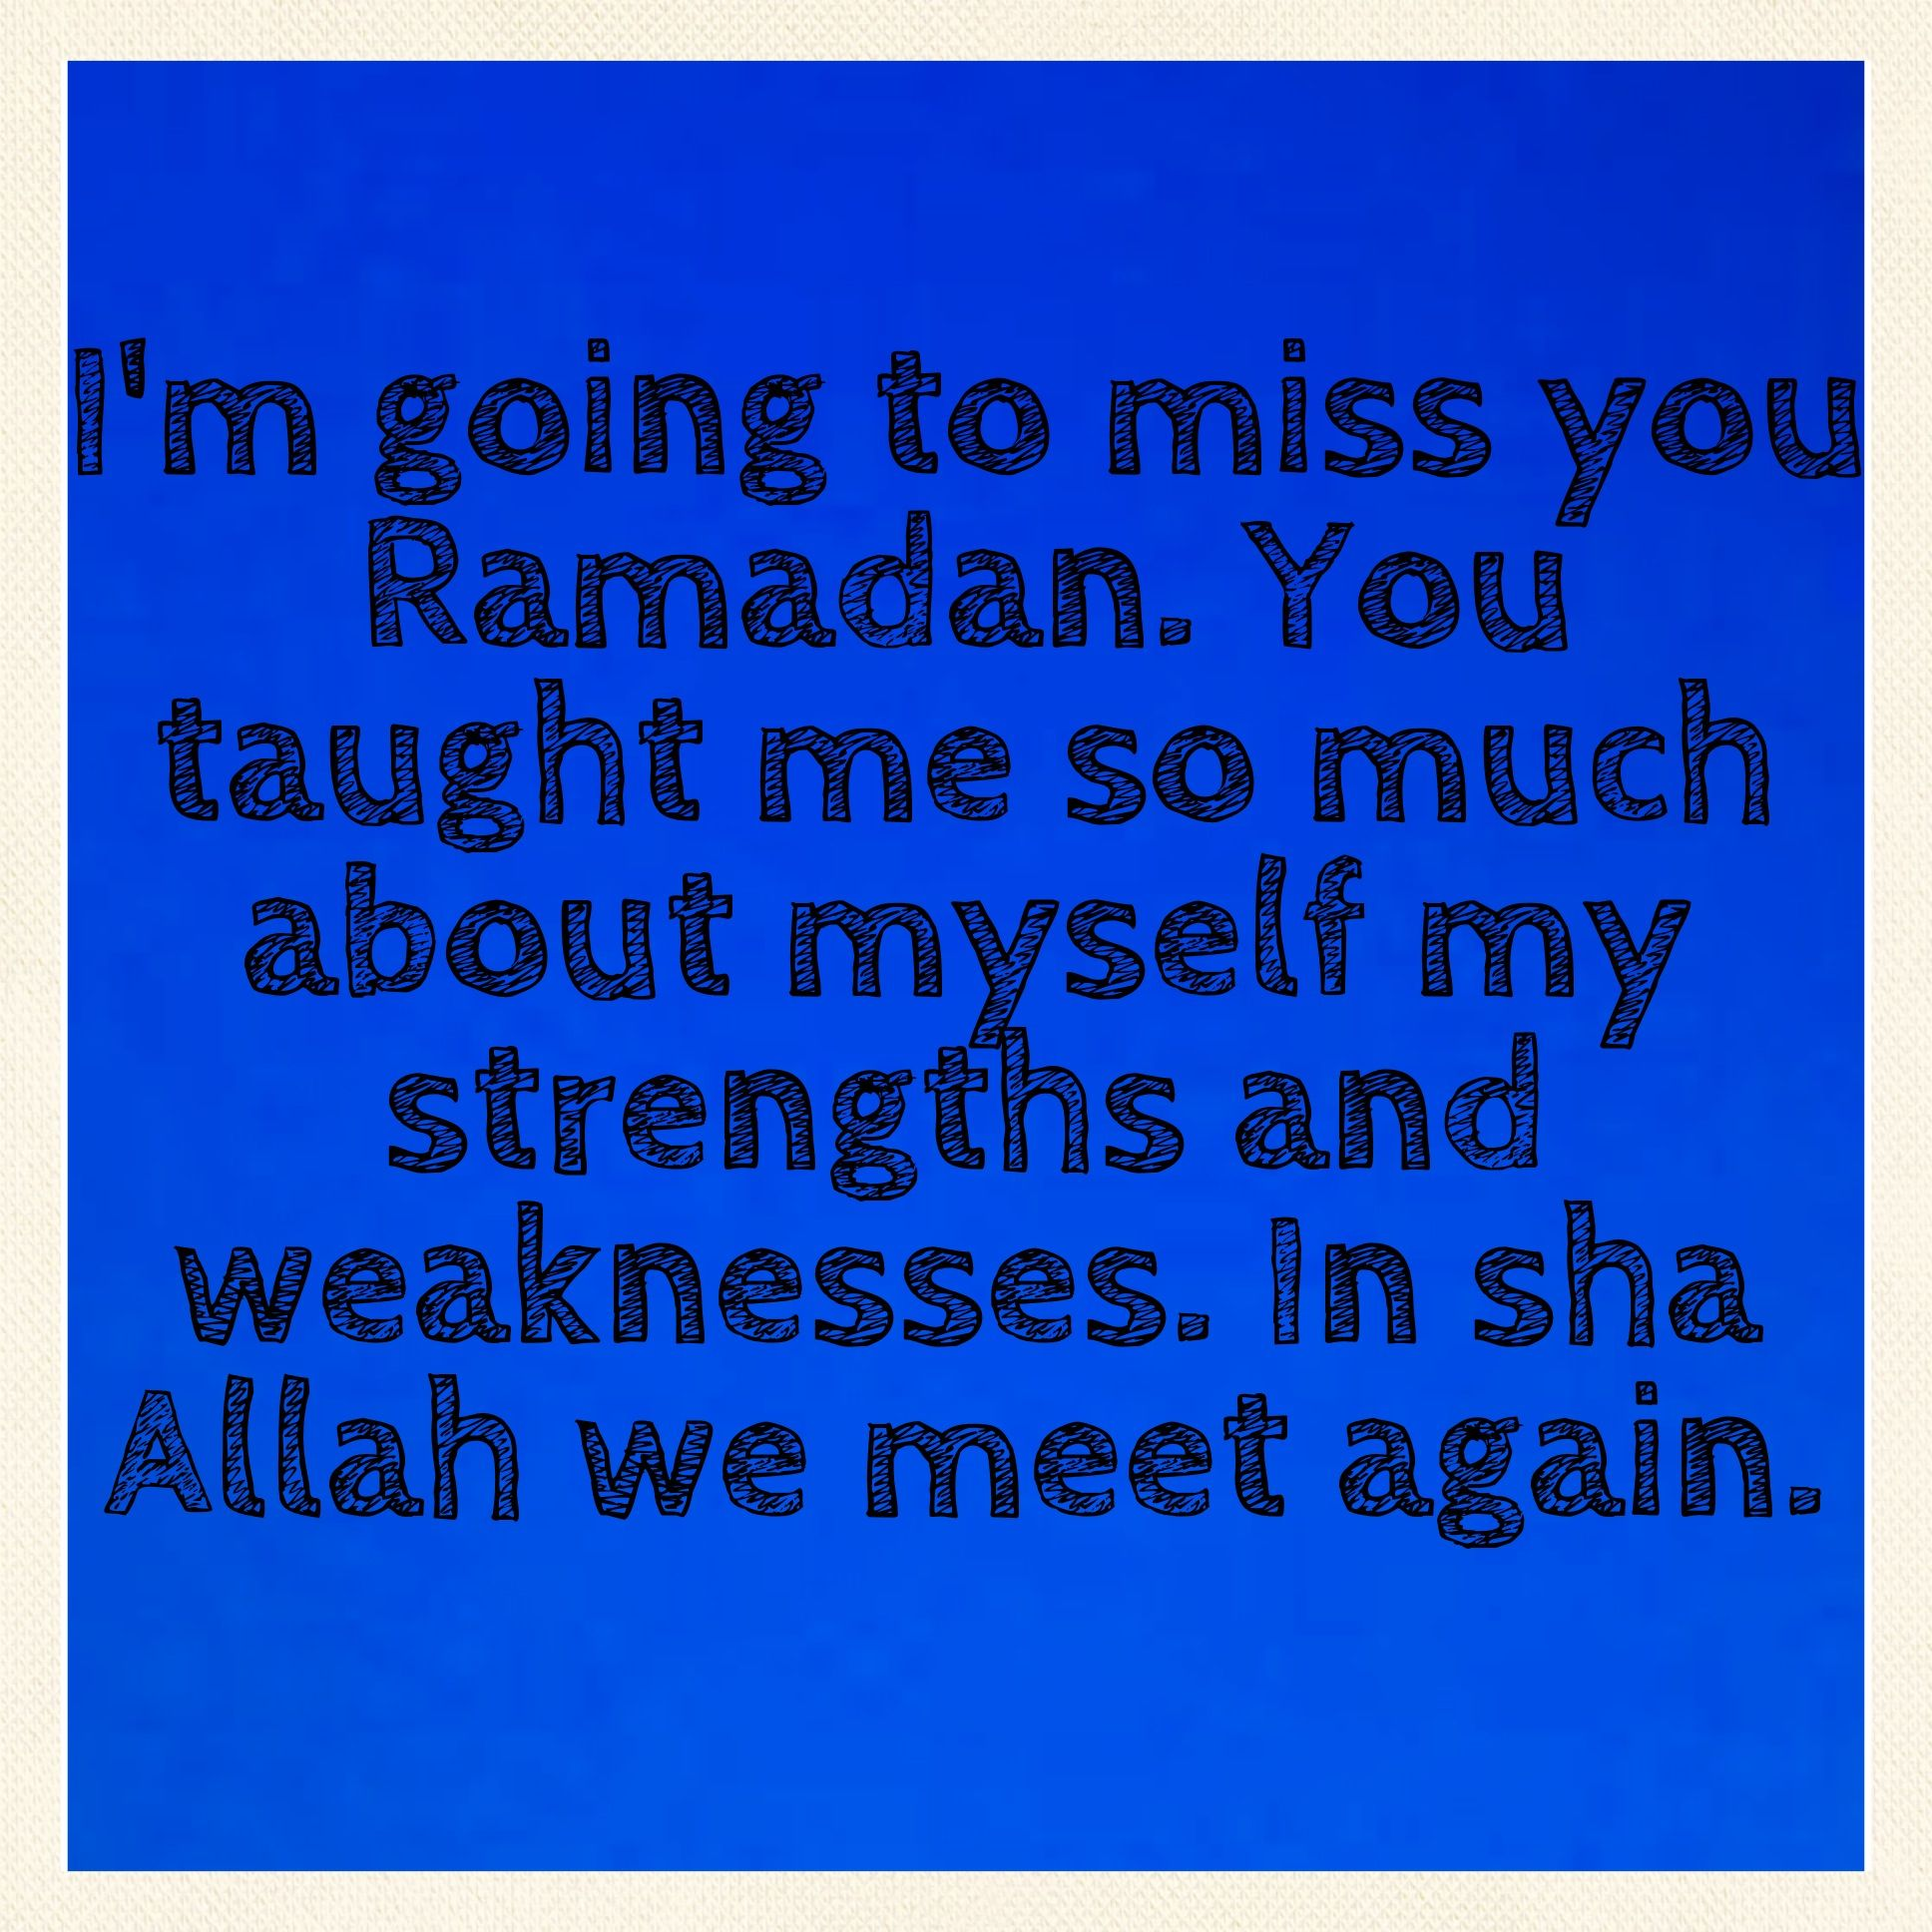 Miss you already ramadan